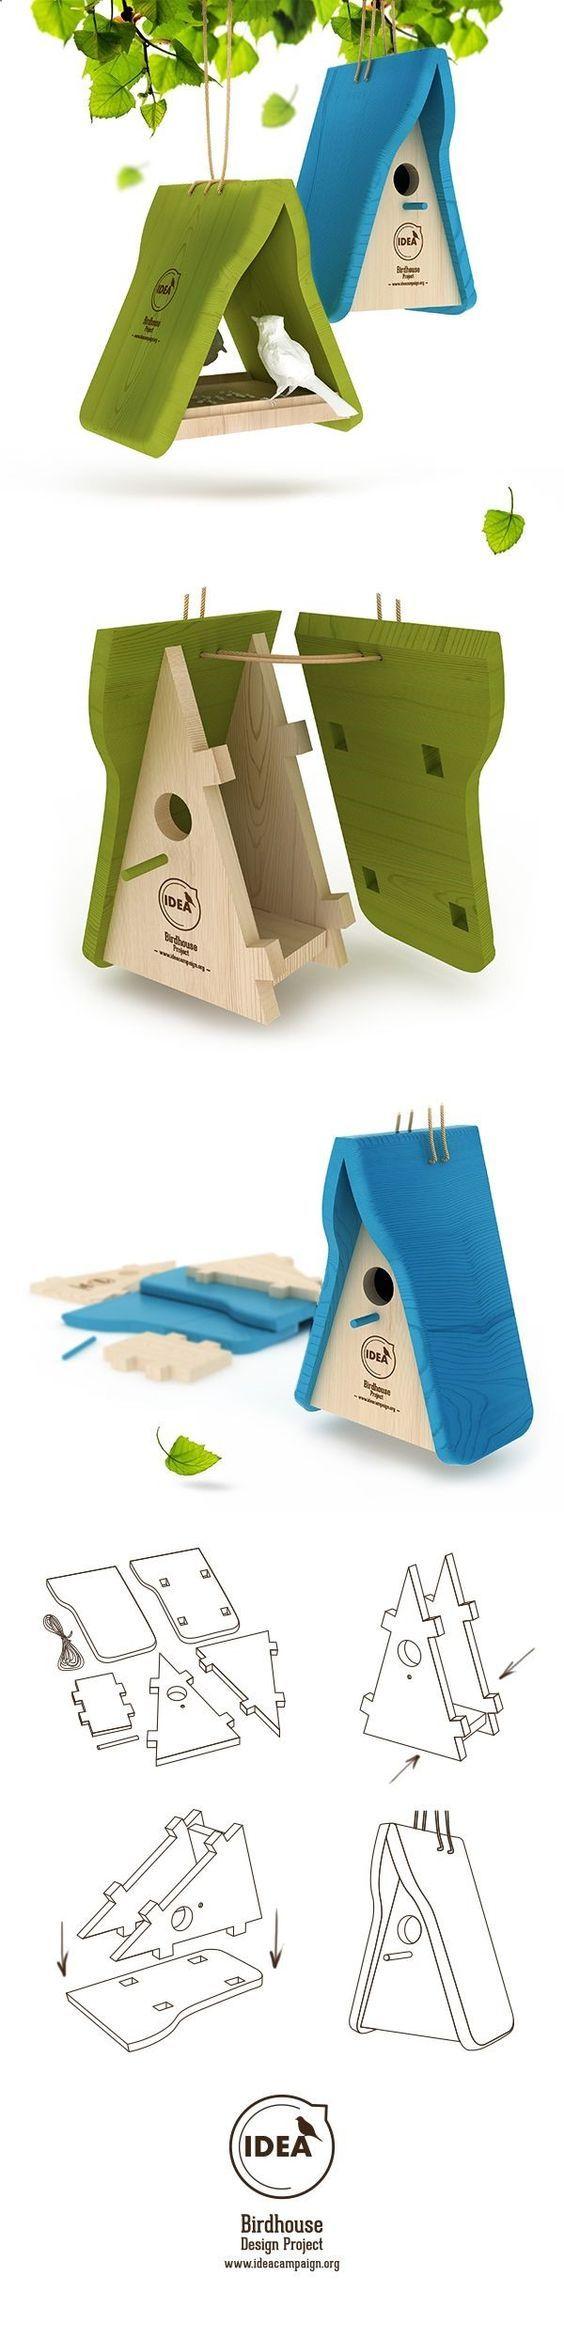 Birdhouse and bird feeders by Tatiana Burdyugina, via Behance - gnar productsgnar products: